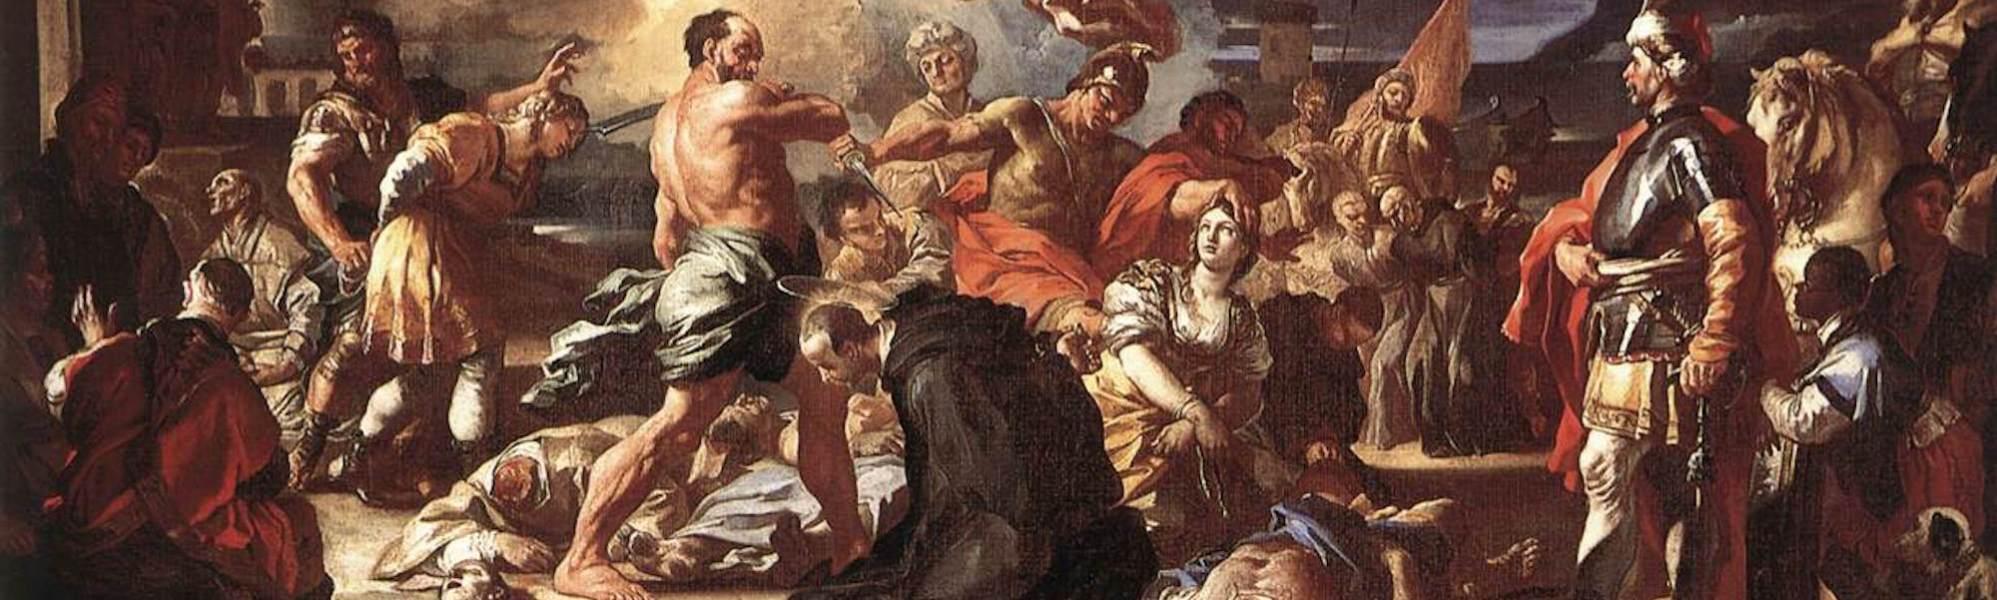 Solimena_Francesco_-_The_Martyrdom_of_Sts_Placidus_and_Flavia_-_1697-1708